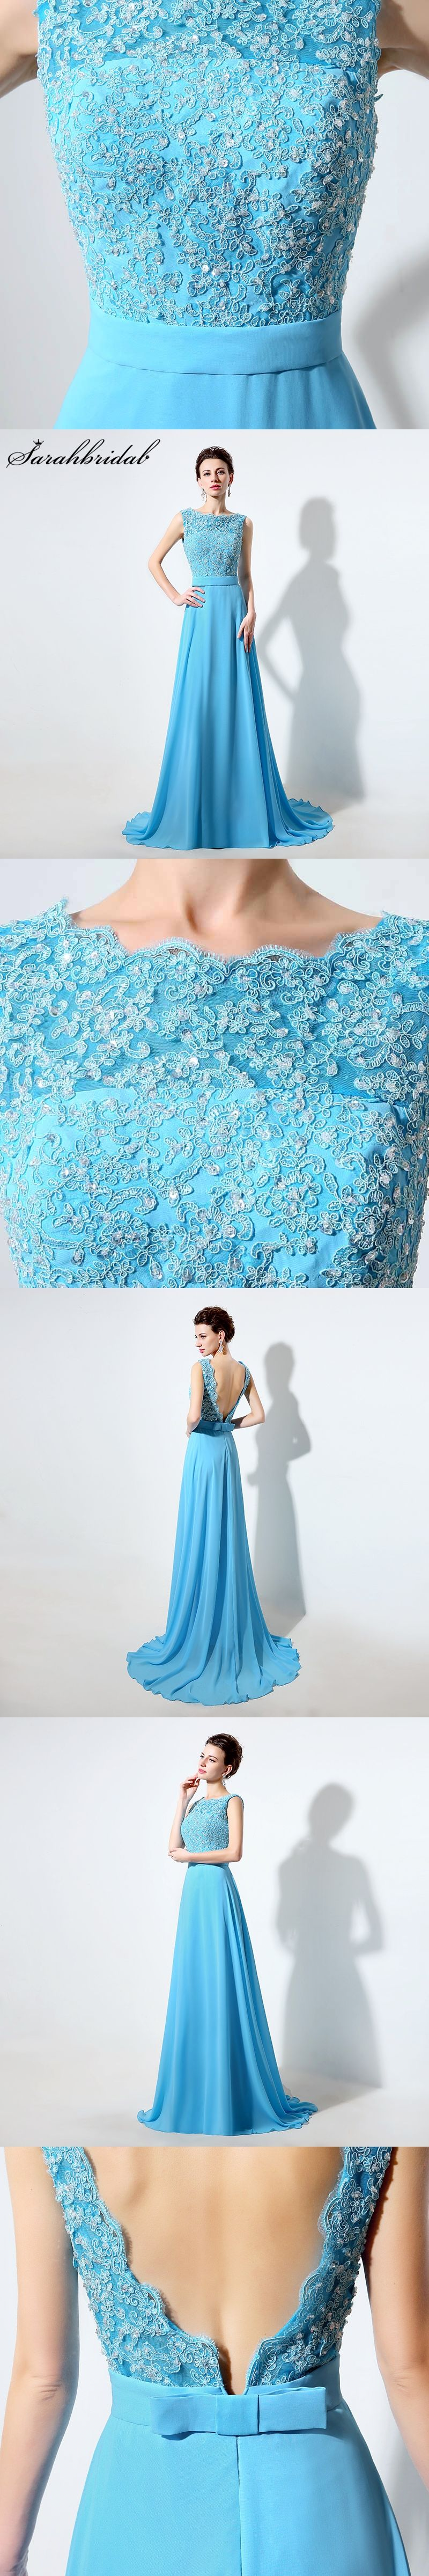 New arrive long chiffon prom dresses sleeveless vback aline